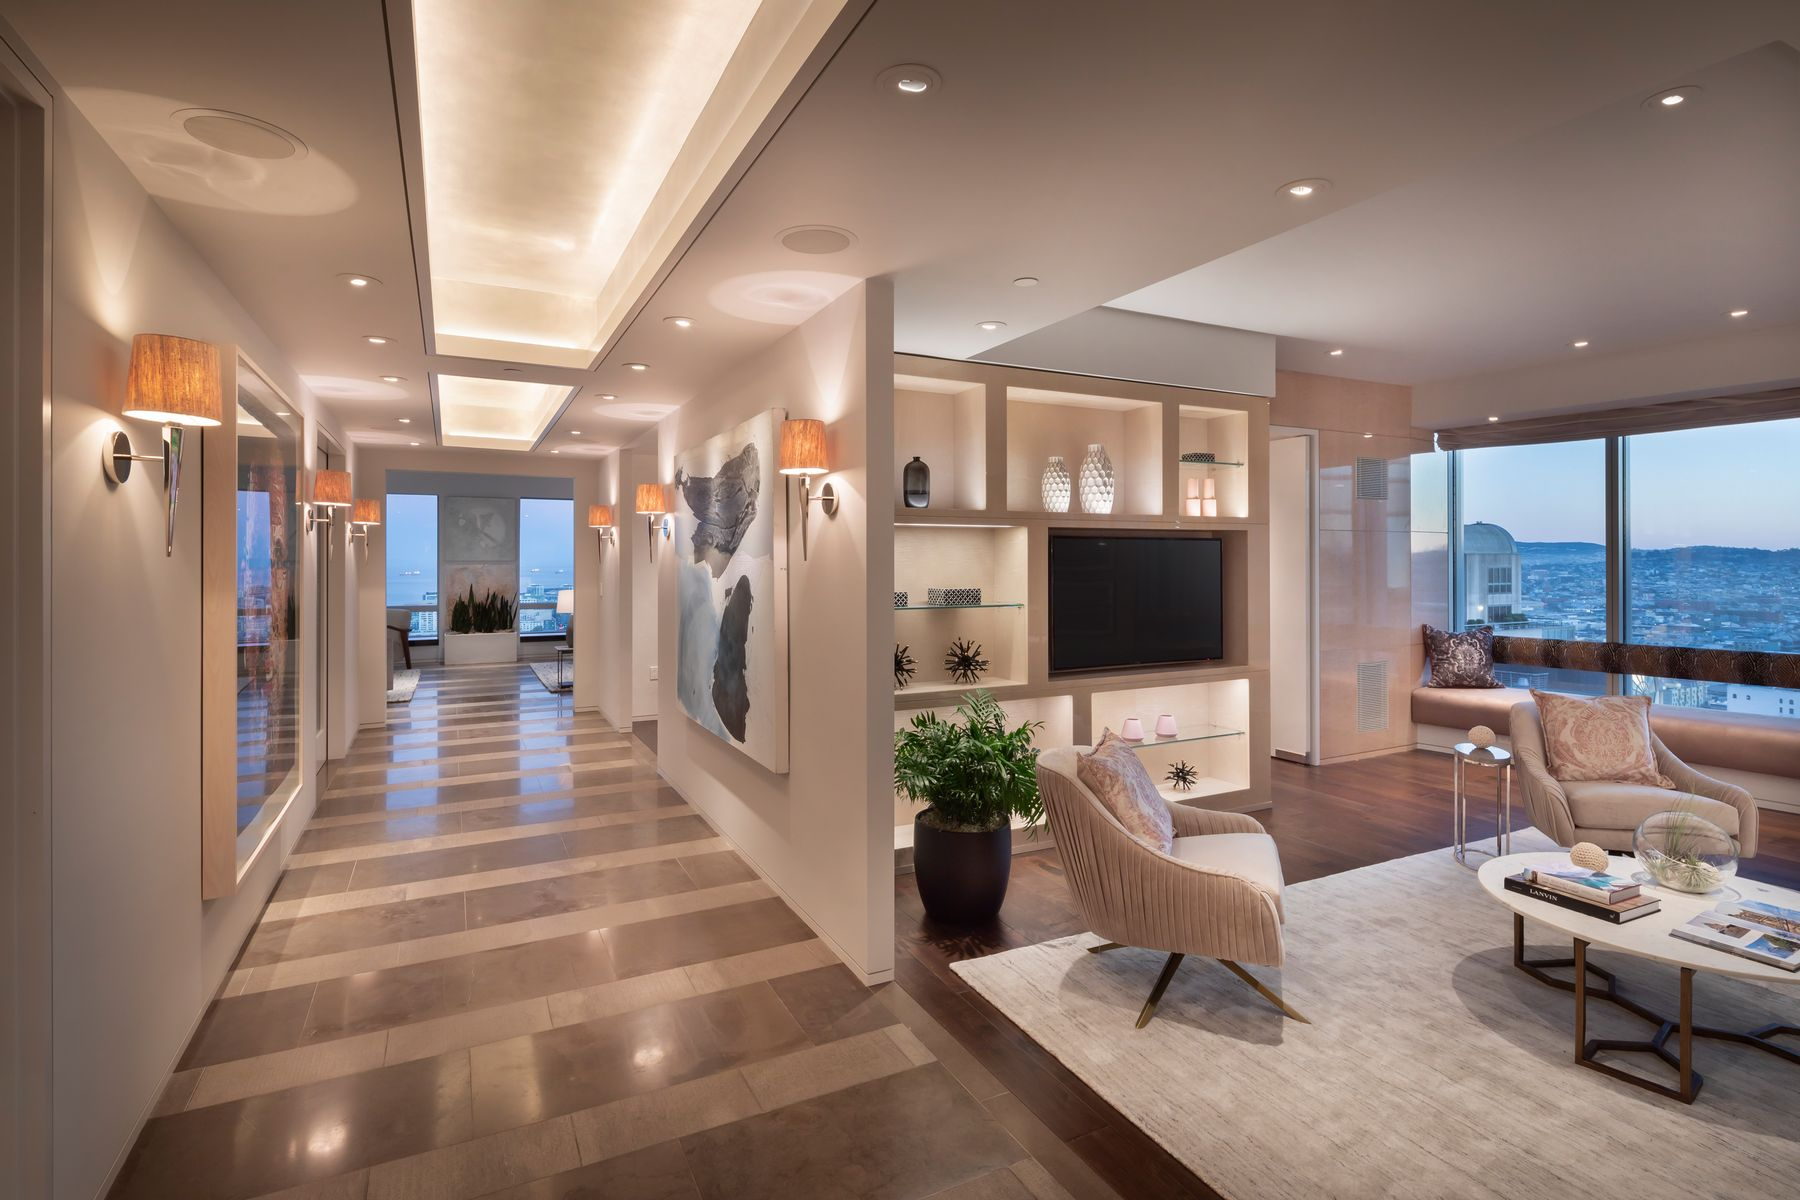 Condominiums 为 销售 在 4,550 SqFt Four Seasons Residence 34A 765 Market St Apt 34A 旧金山, 加利福尼亚州 94103 美国